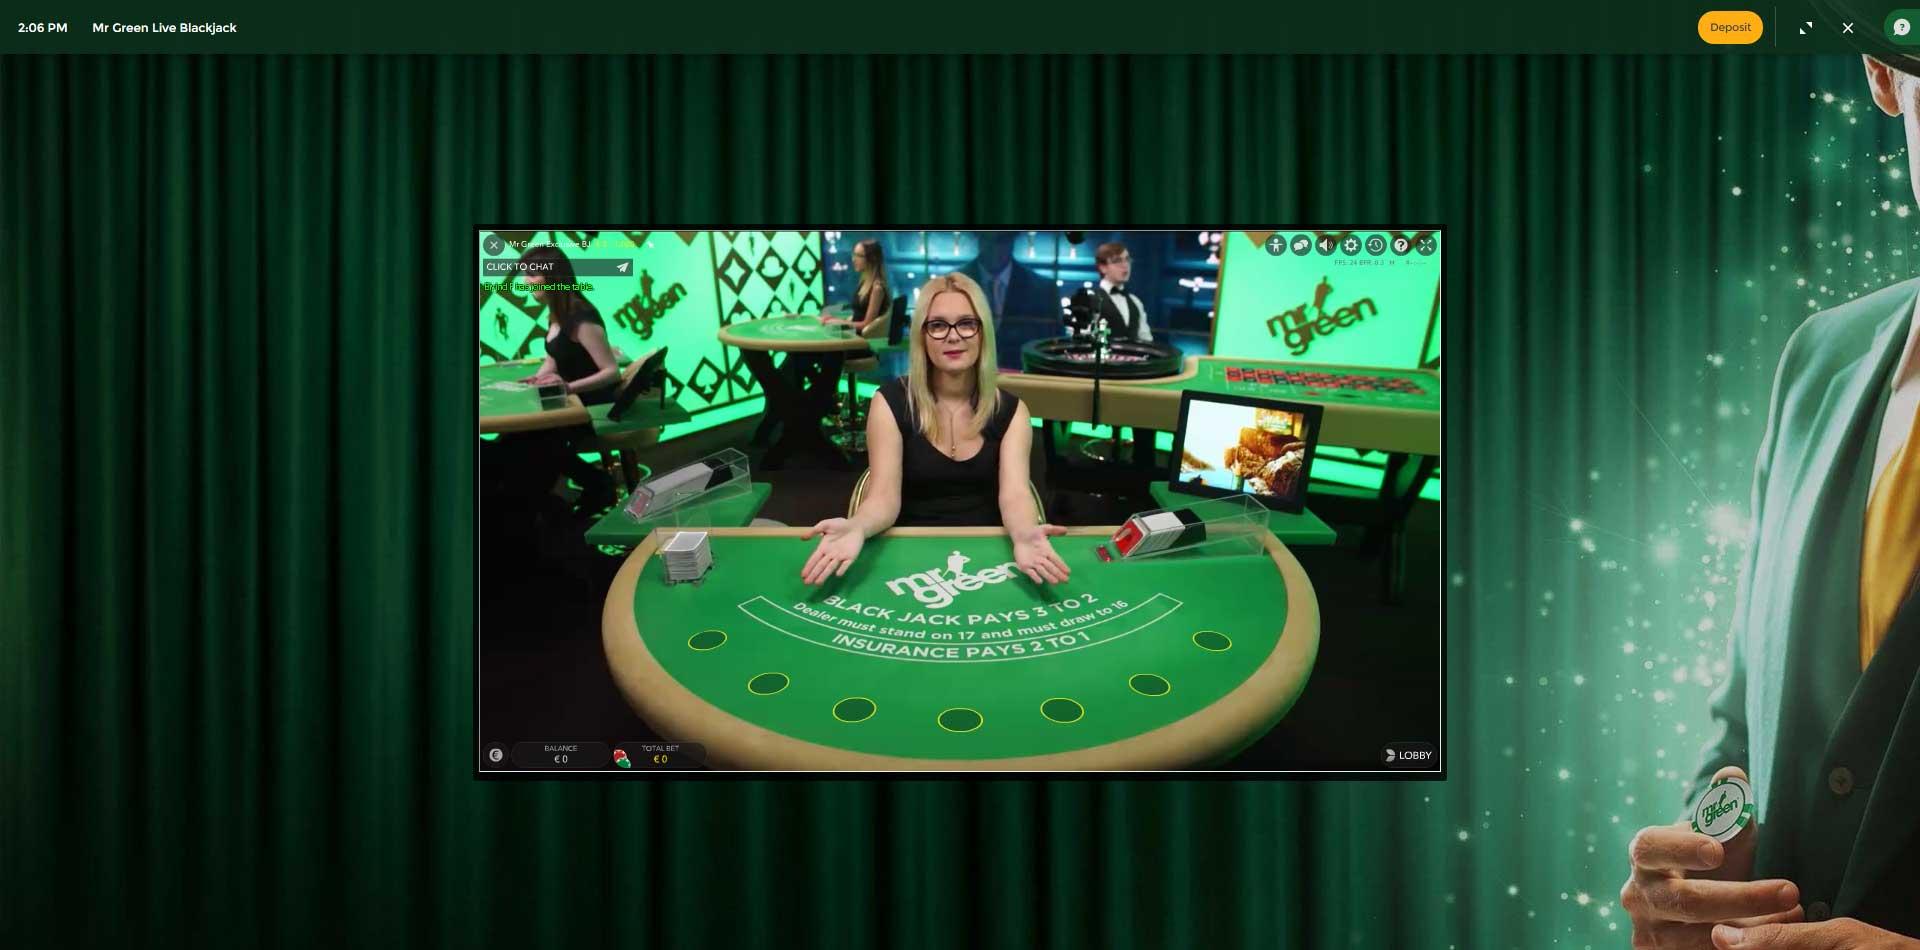 mr green casino customer service